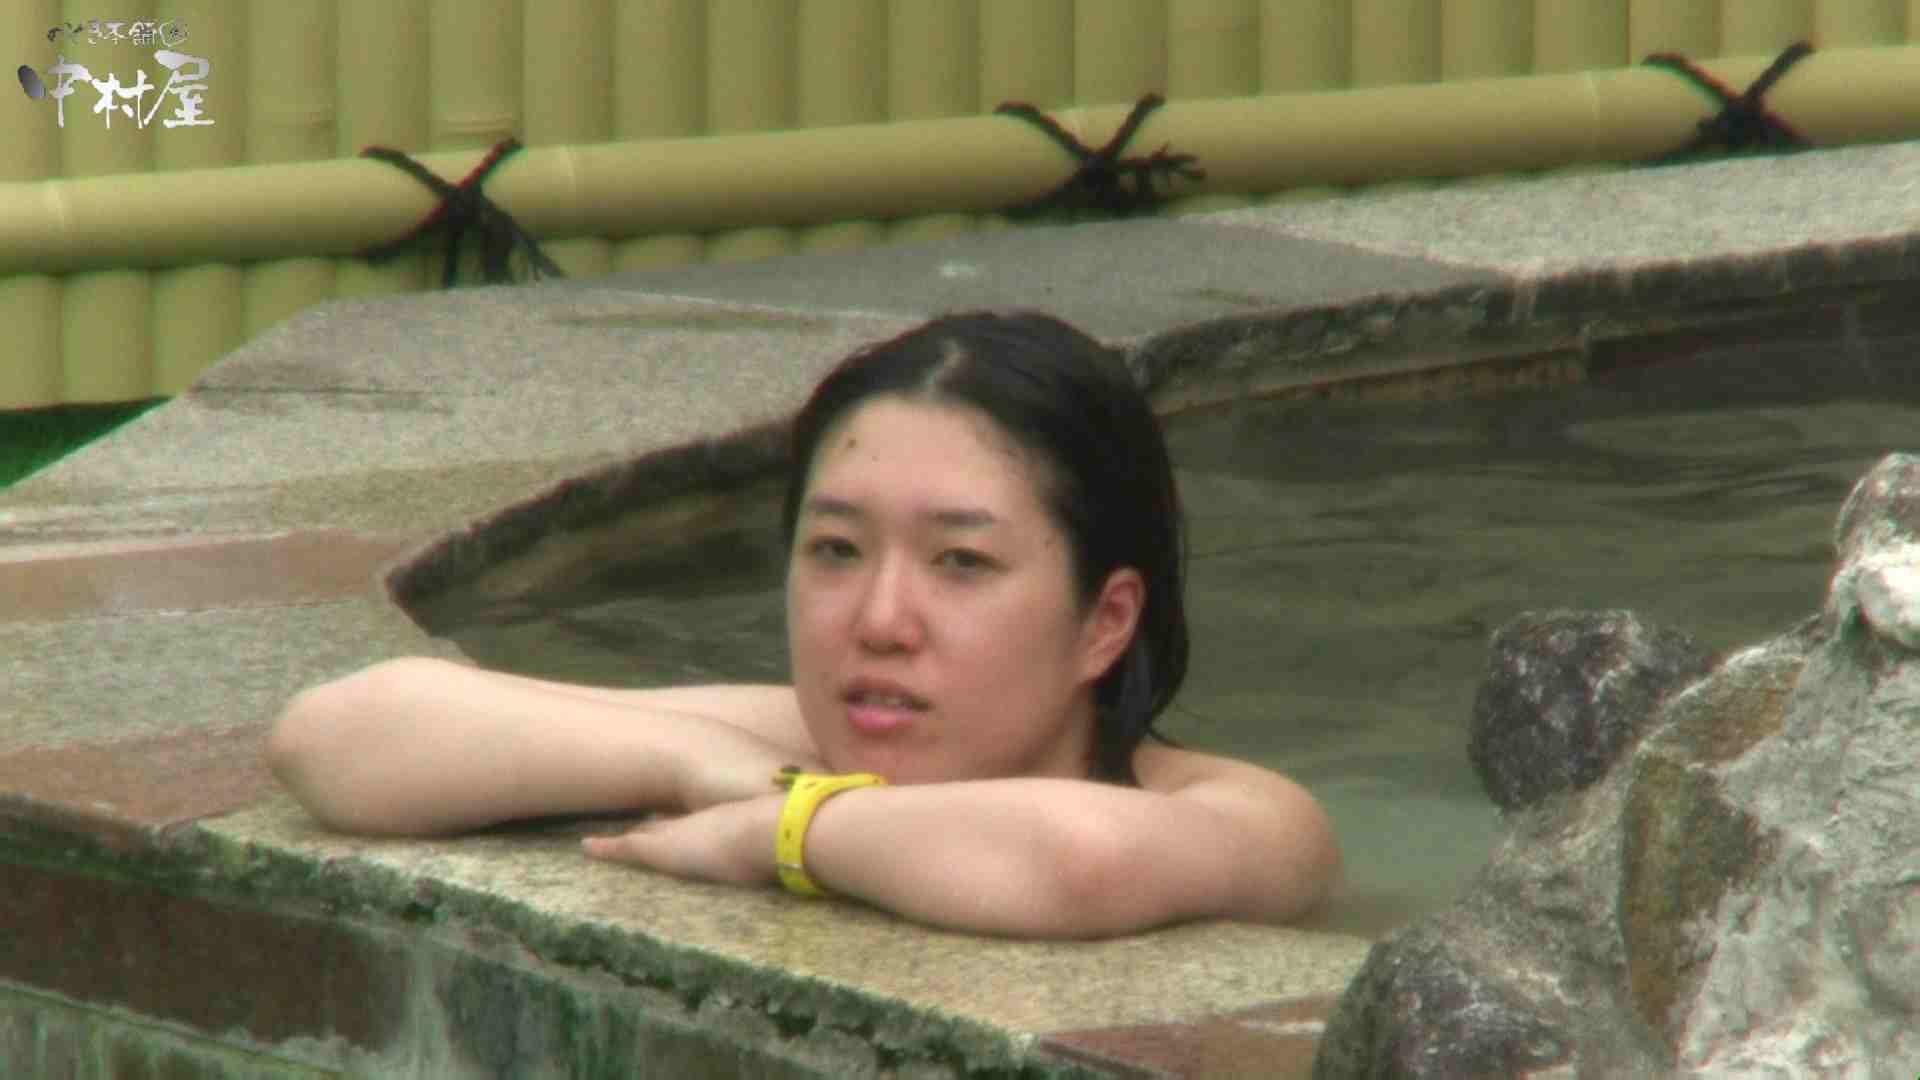 Aquaな露天風呂Vol.946 露天 オマンコ無修正動画無料 64画像 35